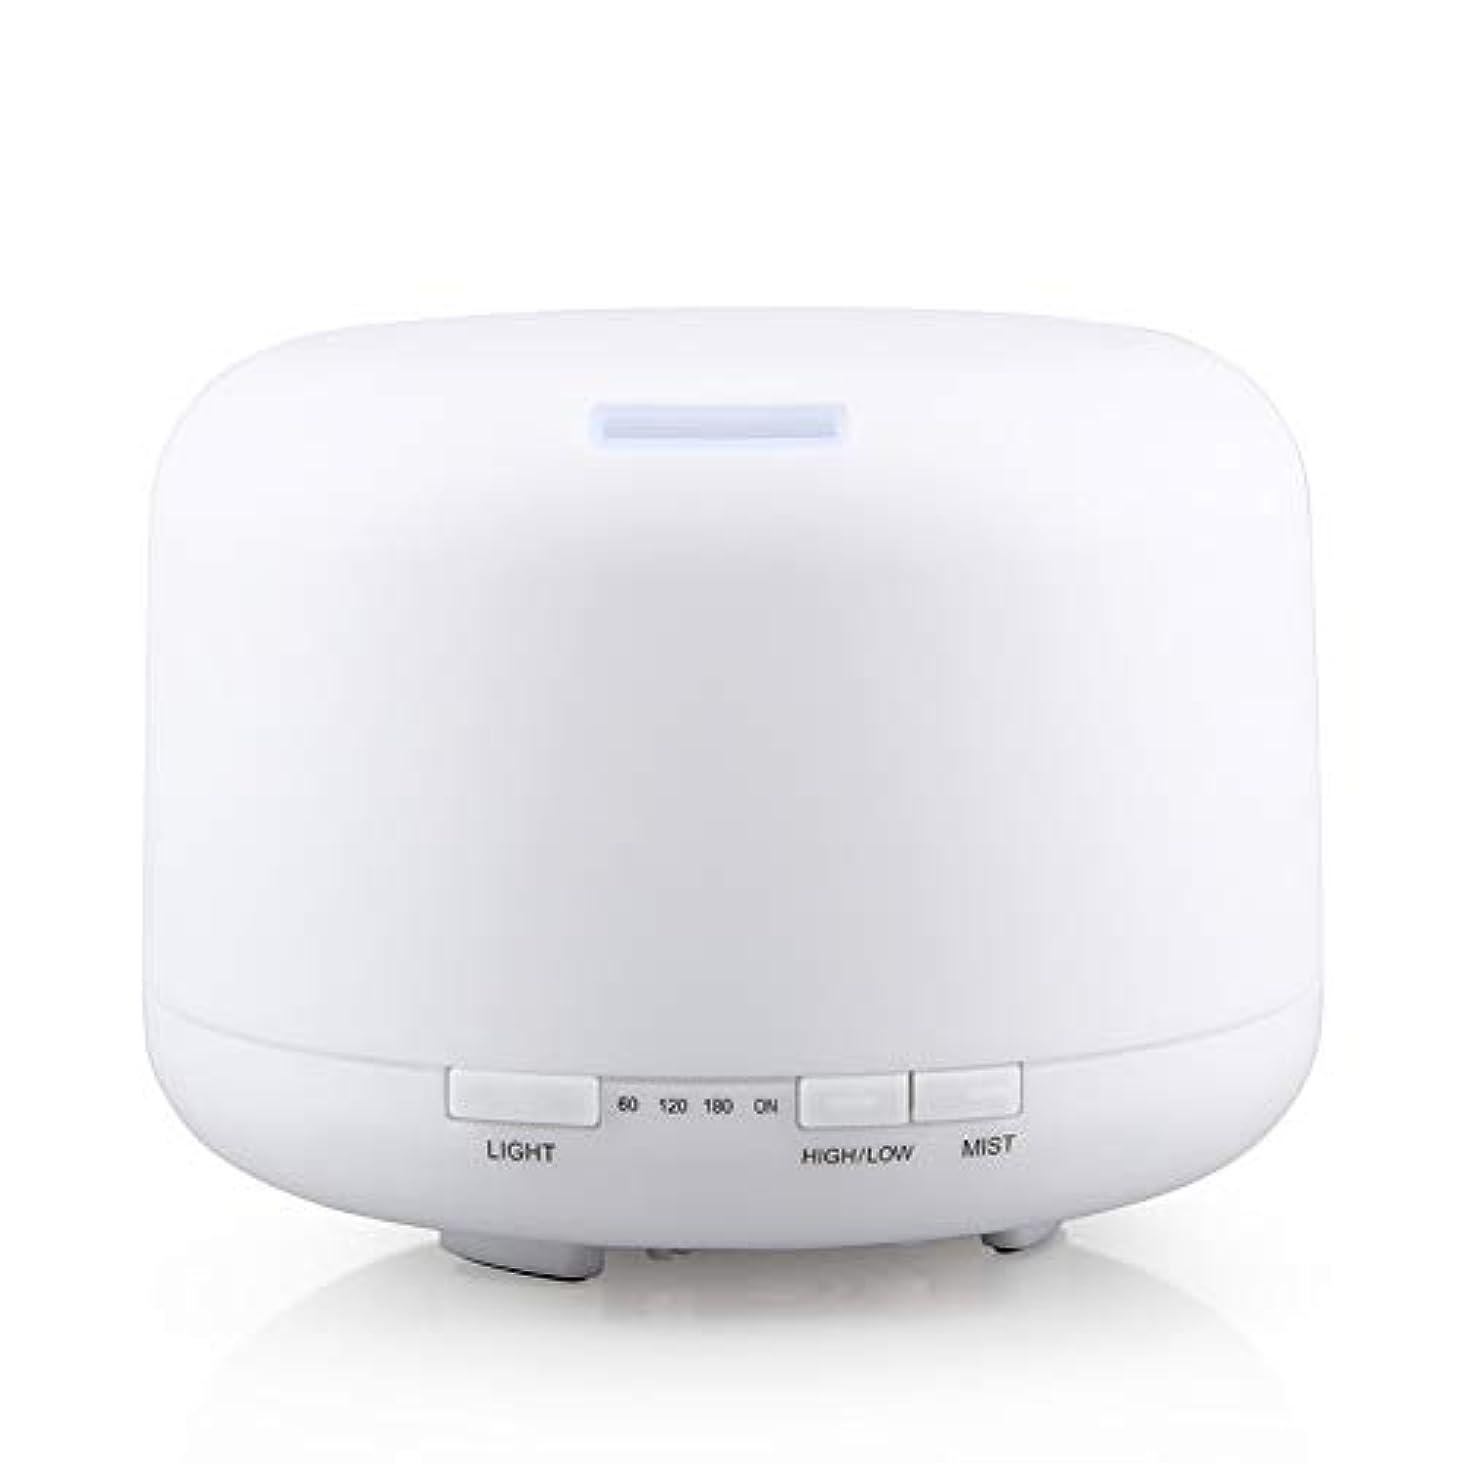 500ml 家庭用加湿器プラグイン超音波アロマセラピーマシンエッセンシャルオイル加湿器ホームナイトライト